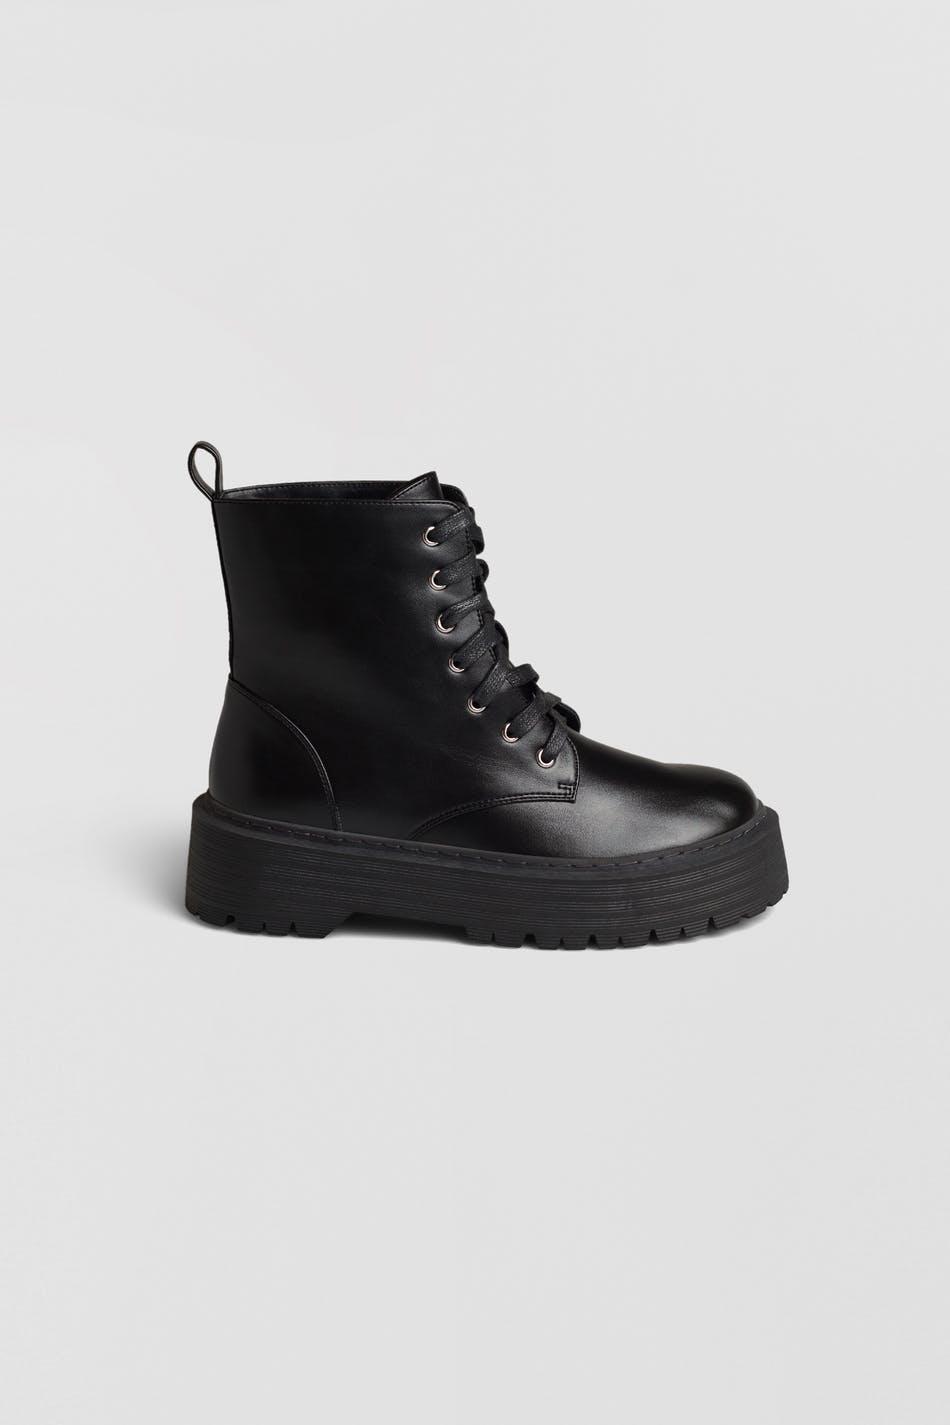 Maddison boots